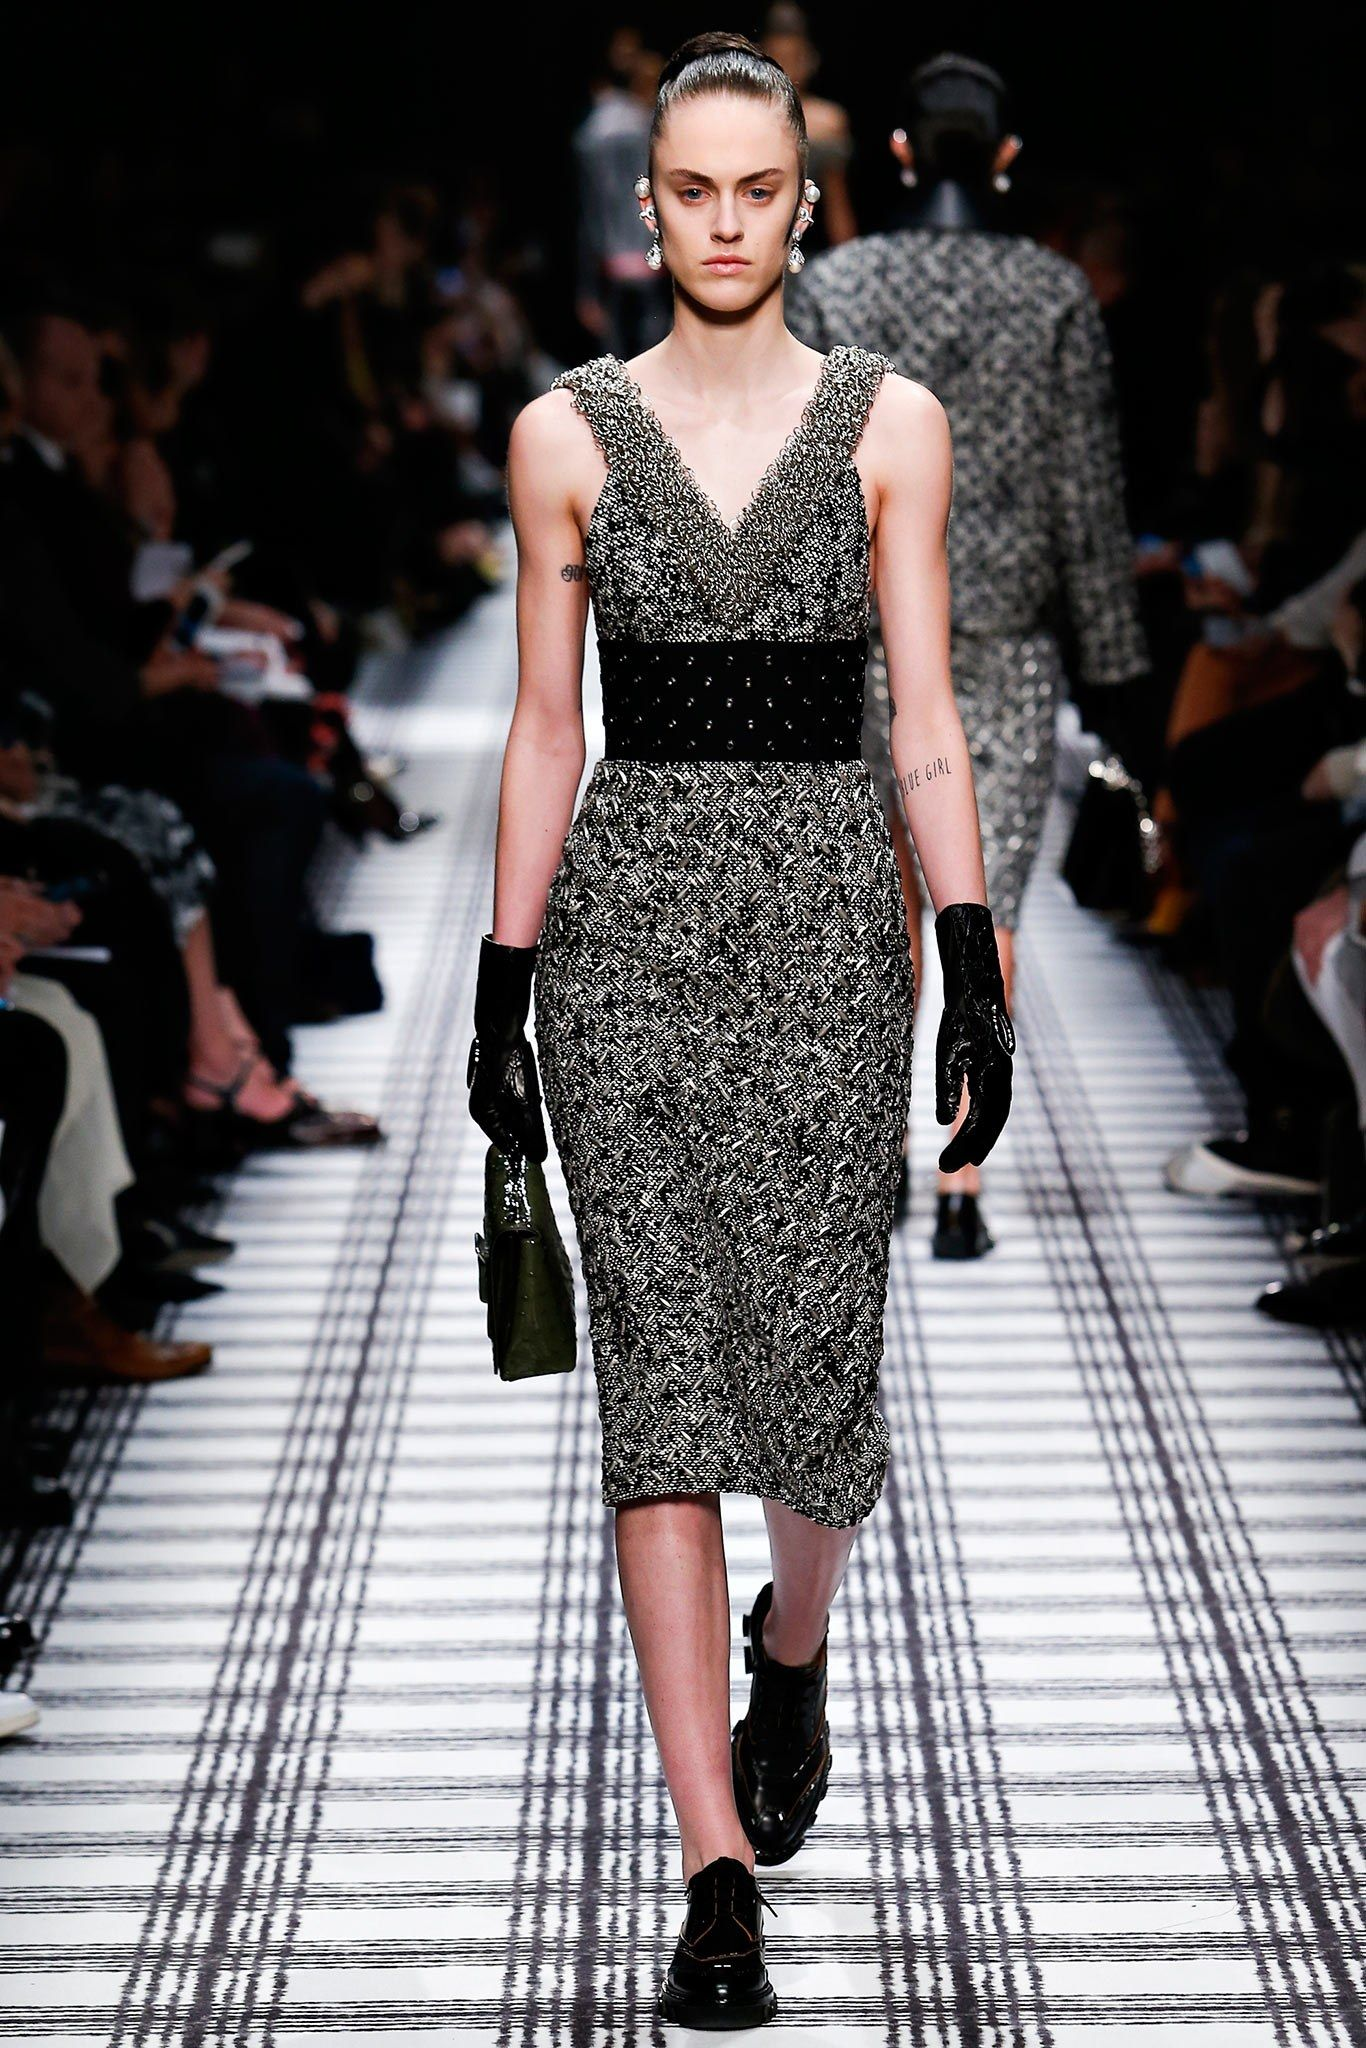 Balenciaga Fall 2015 Ready-to-Wear Fashion Show - Sarah Brannon (OUI)